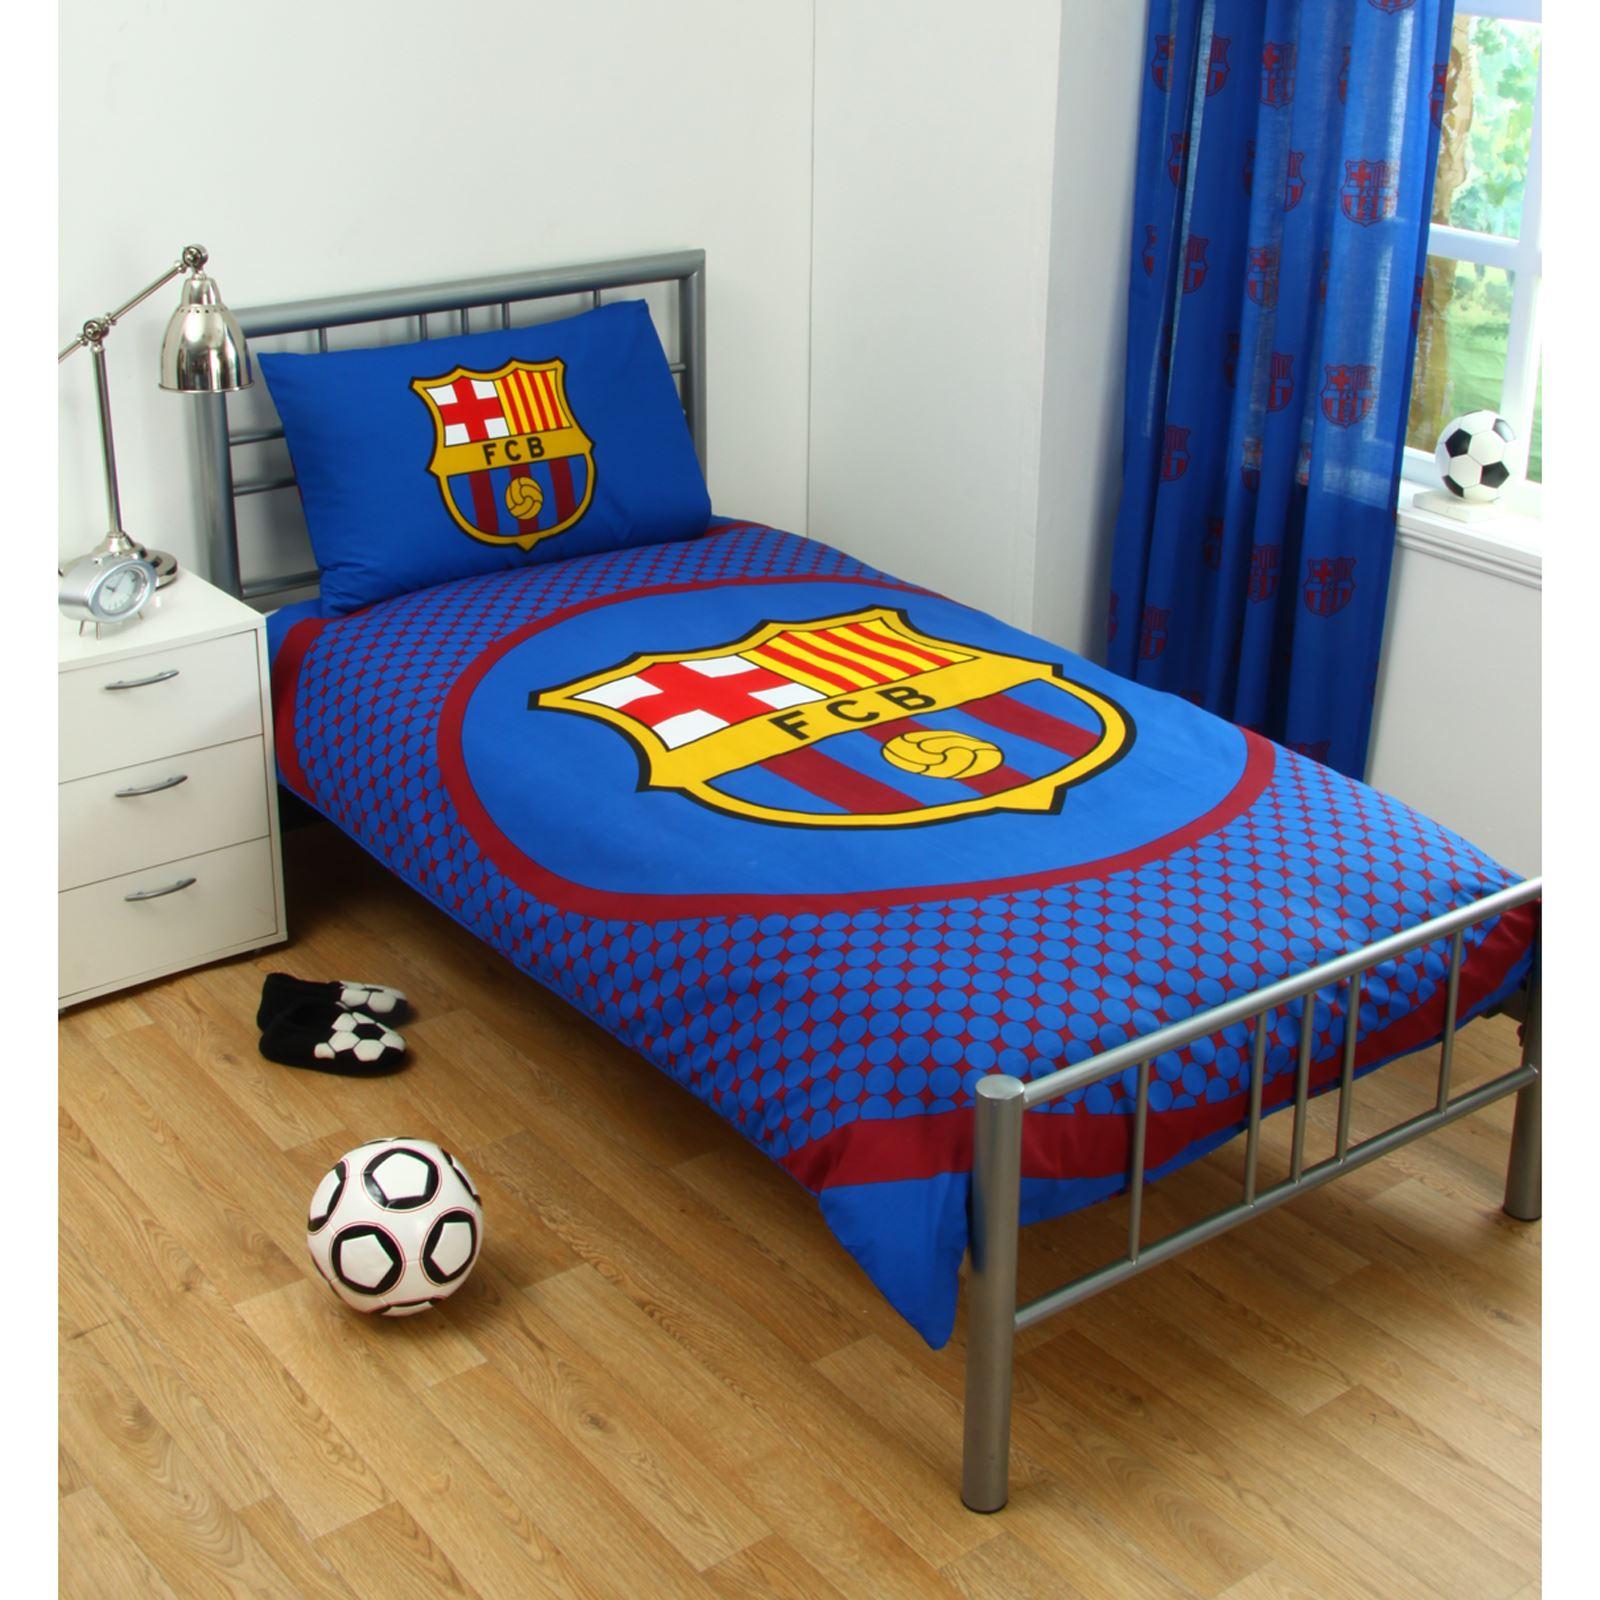 BARCELONA BEDDING BEDROOM ACCESSORIES BOYS FOOTBALL